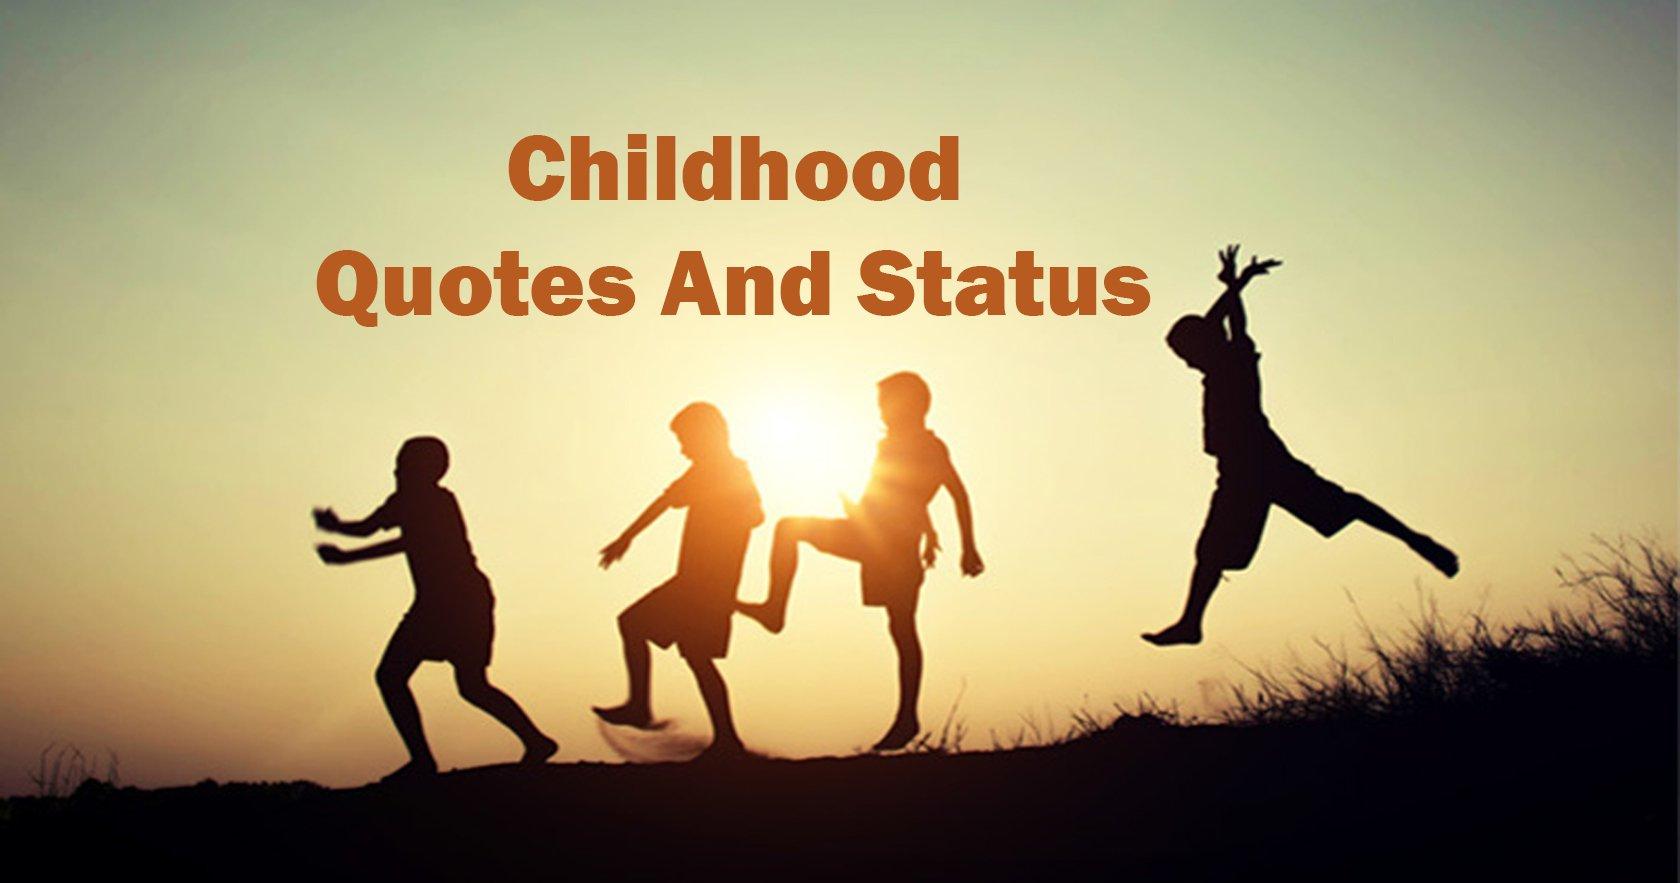 Beautiful Childhood Images